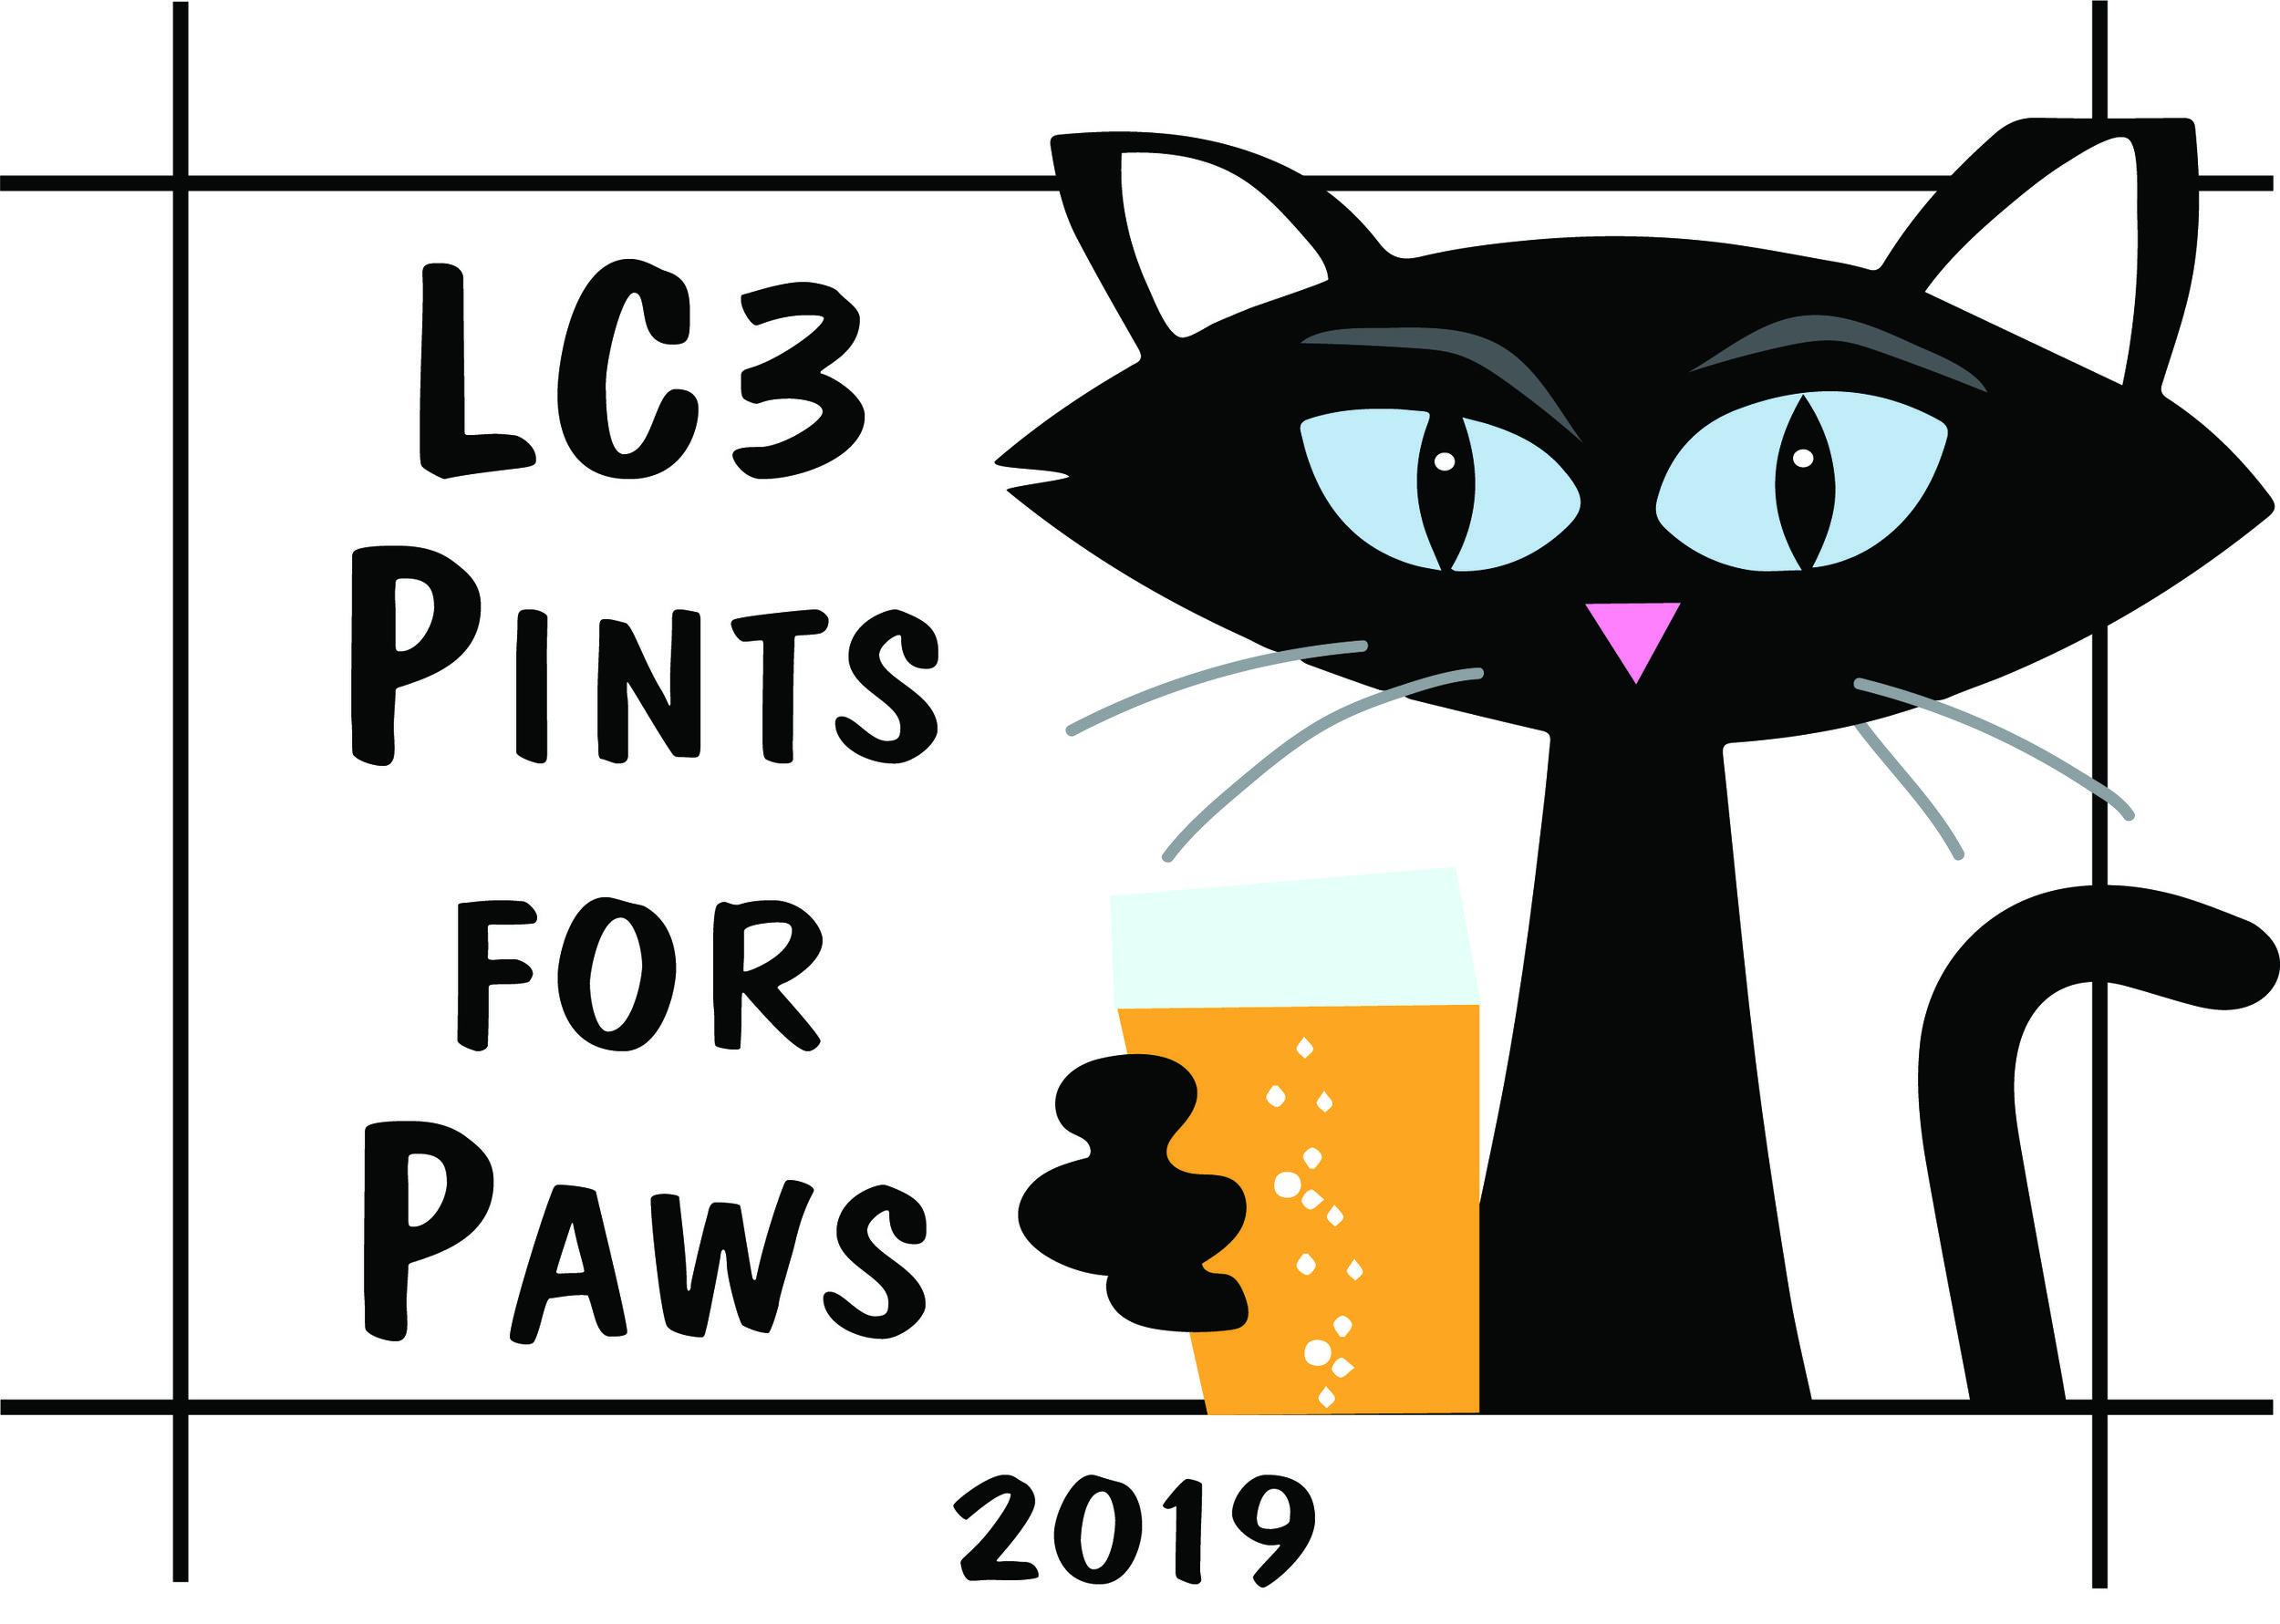 Pints for paws logo 2019.JPG